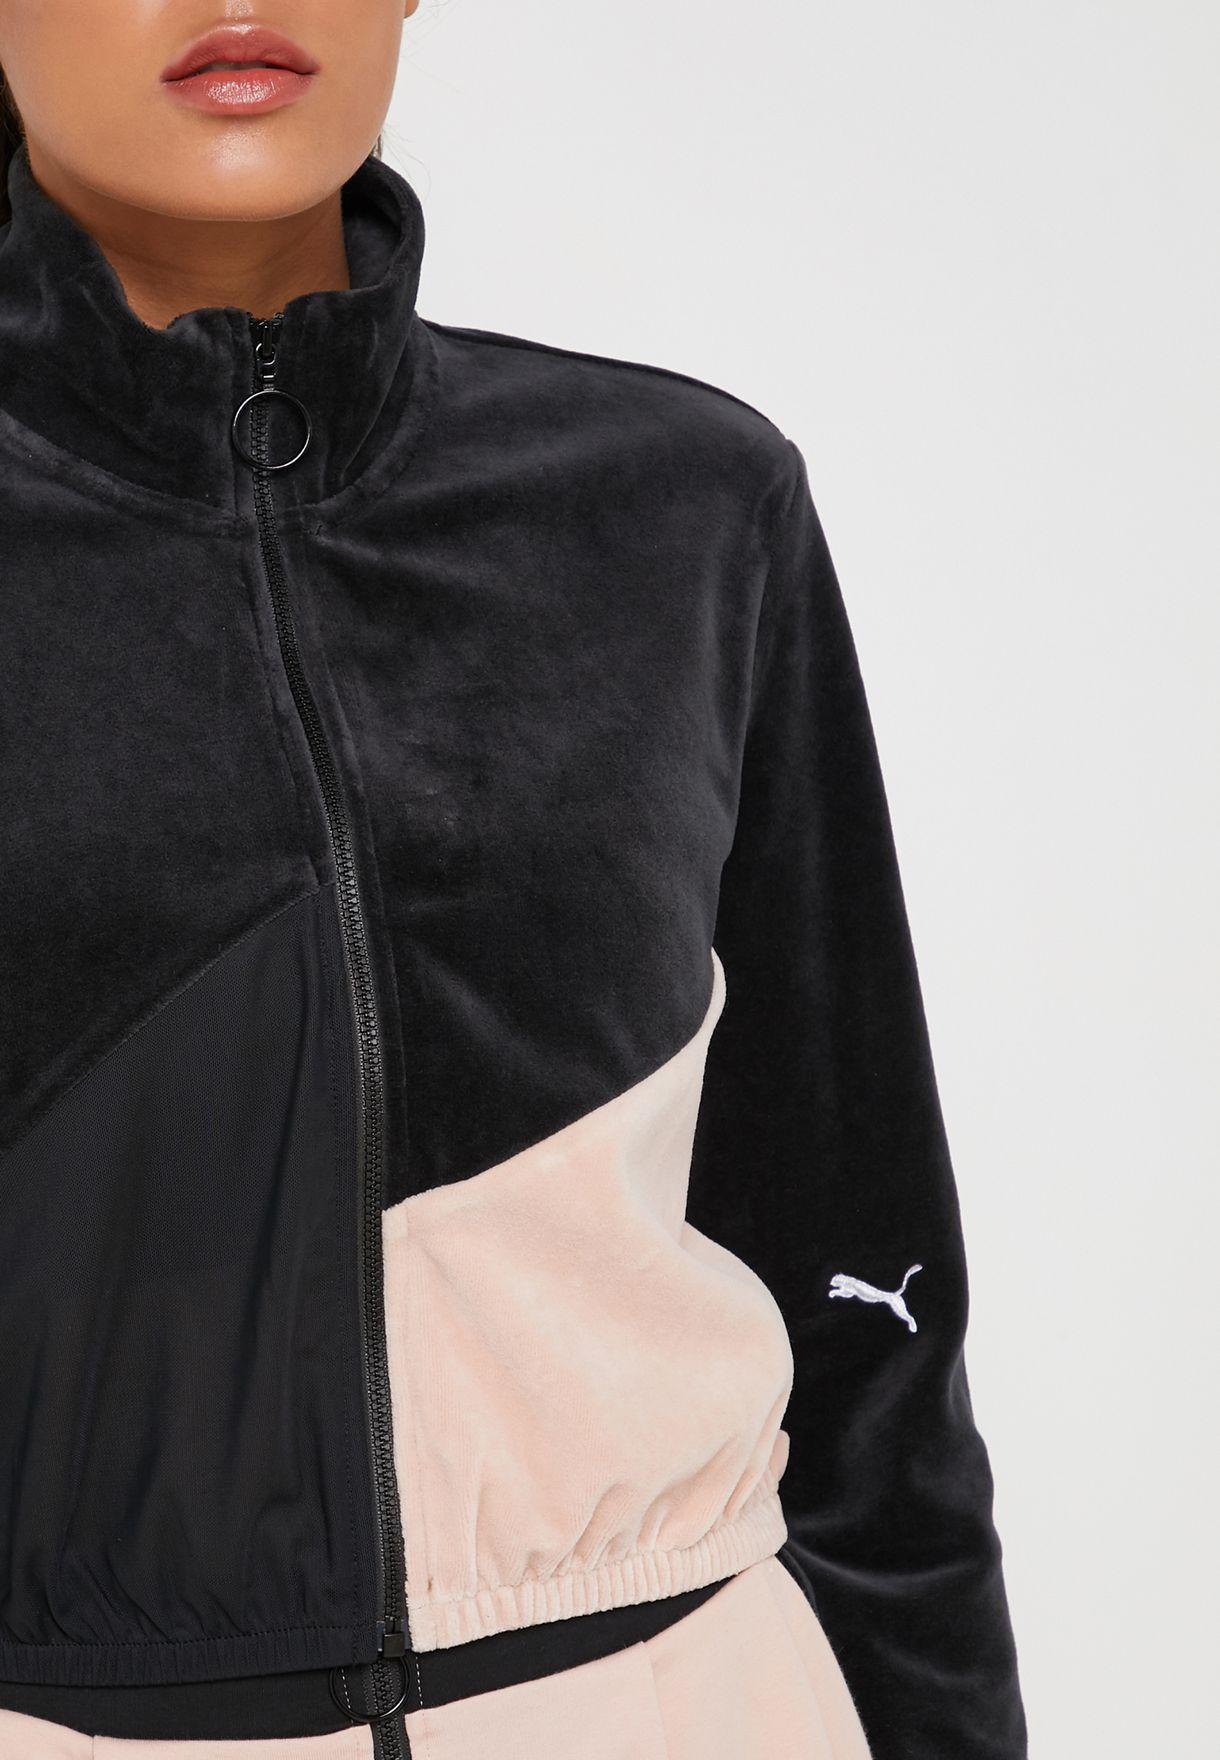 Lama Jouni Rive Gauche Track Jacket